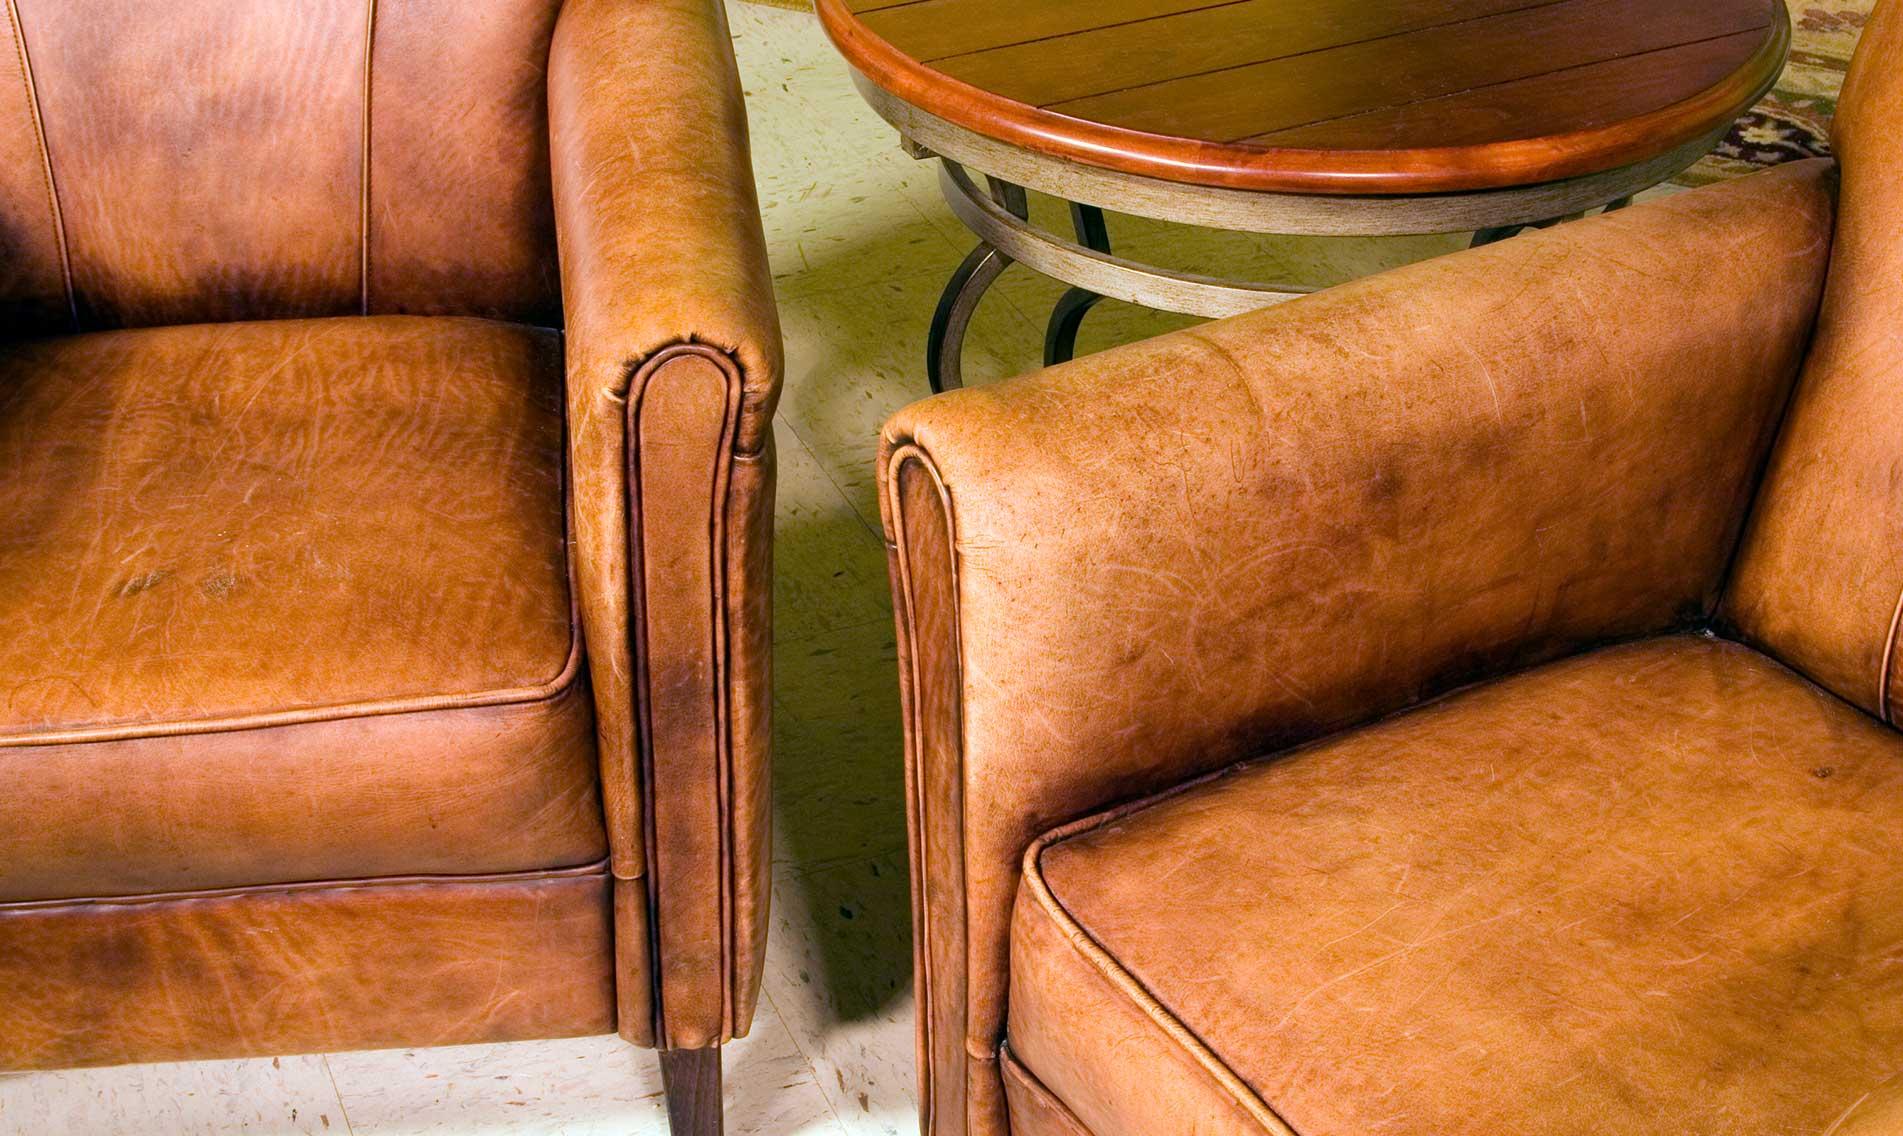 Leather Repair<br> &#038; Restoration